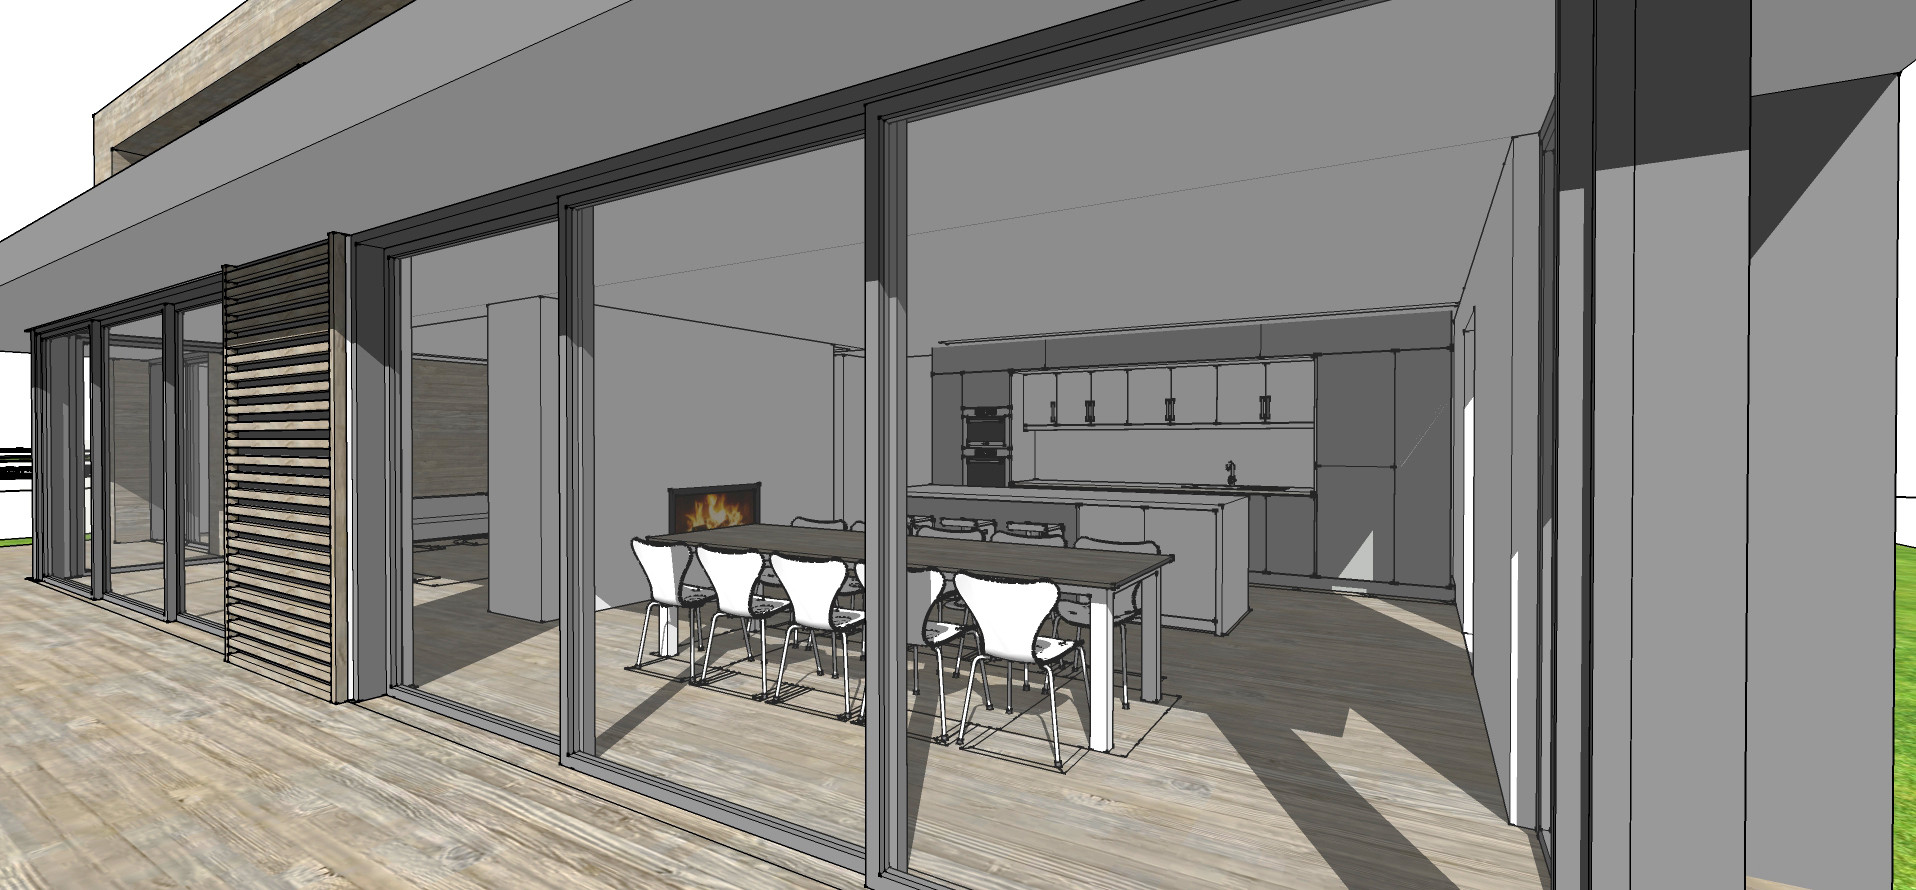 Architectural sketch design 3D model in Haslemere